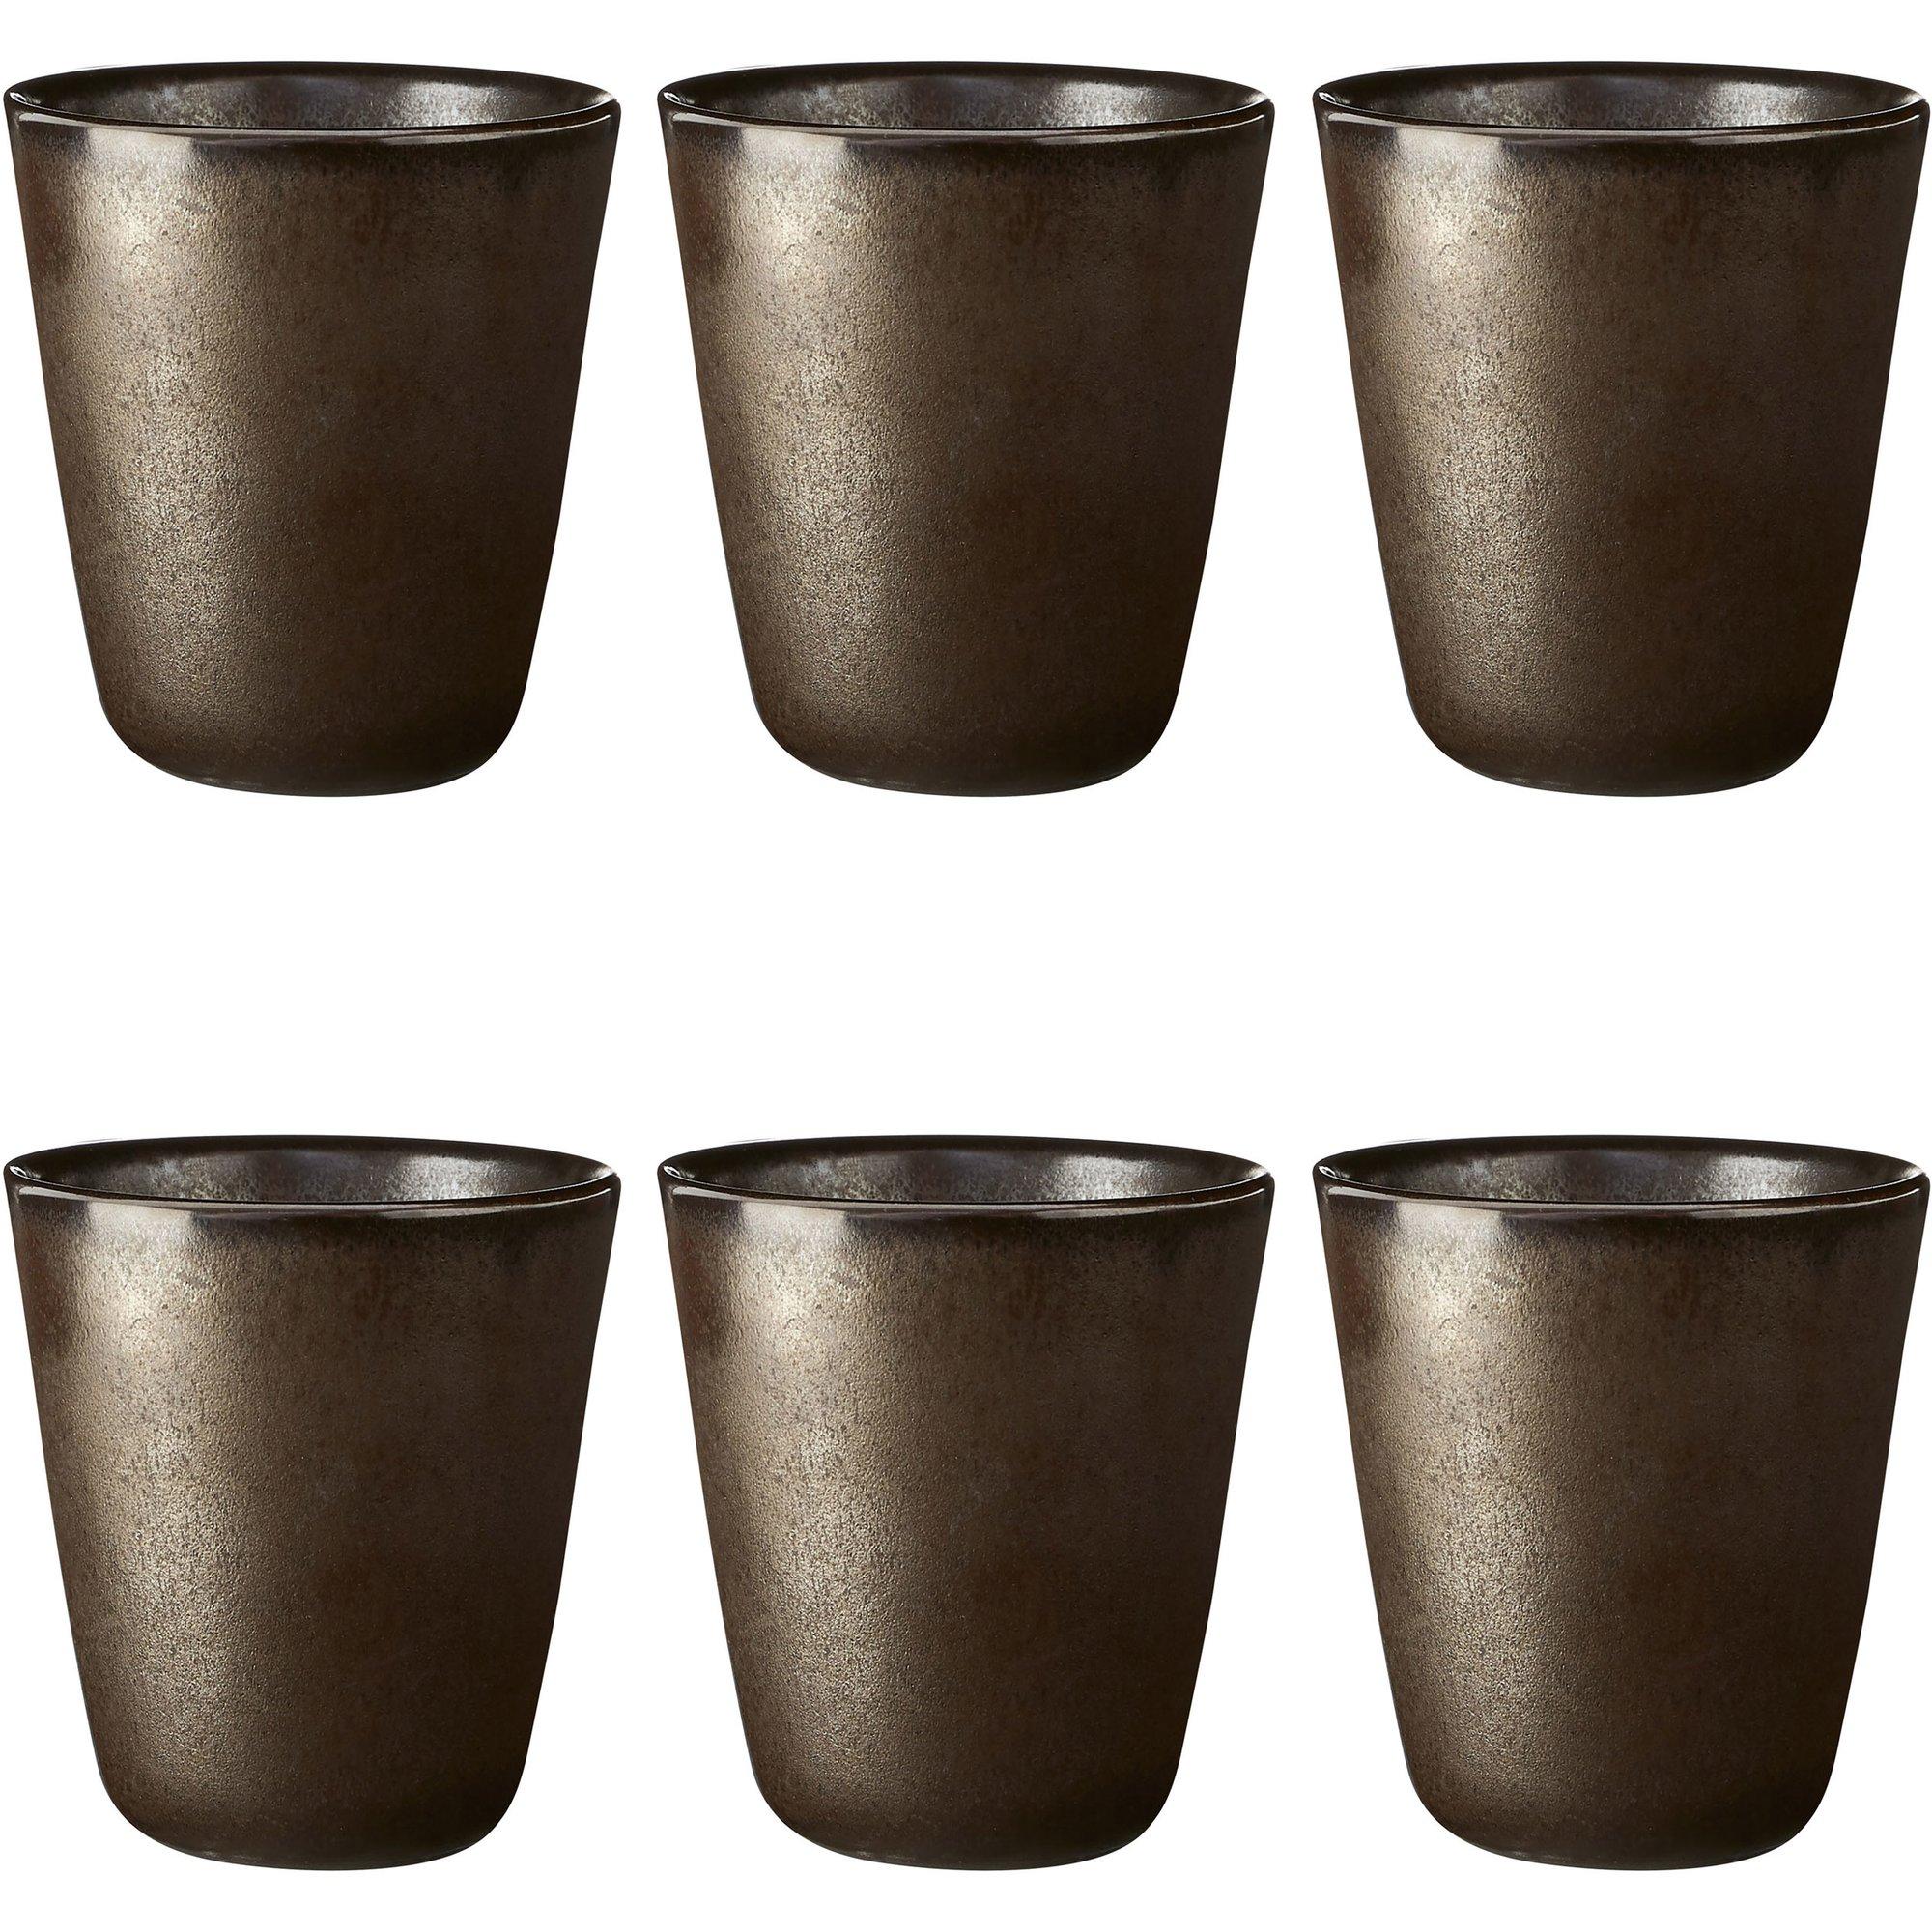 Aida RAW Termomugg 6 st. Metallic Brown